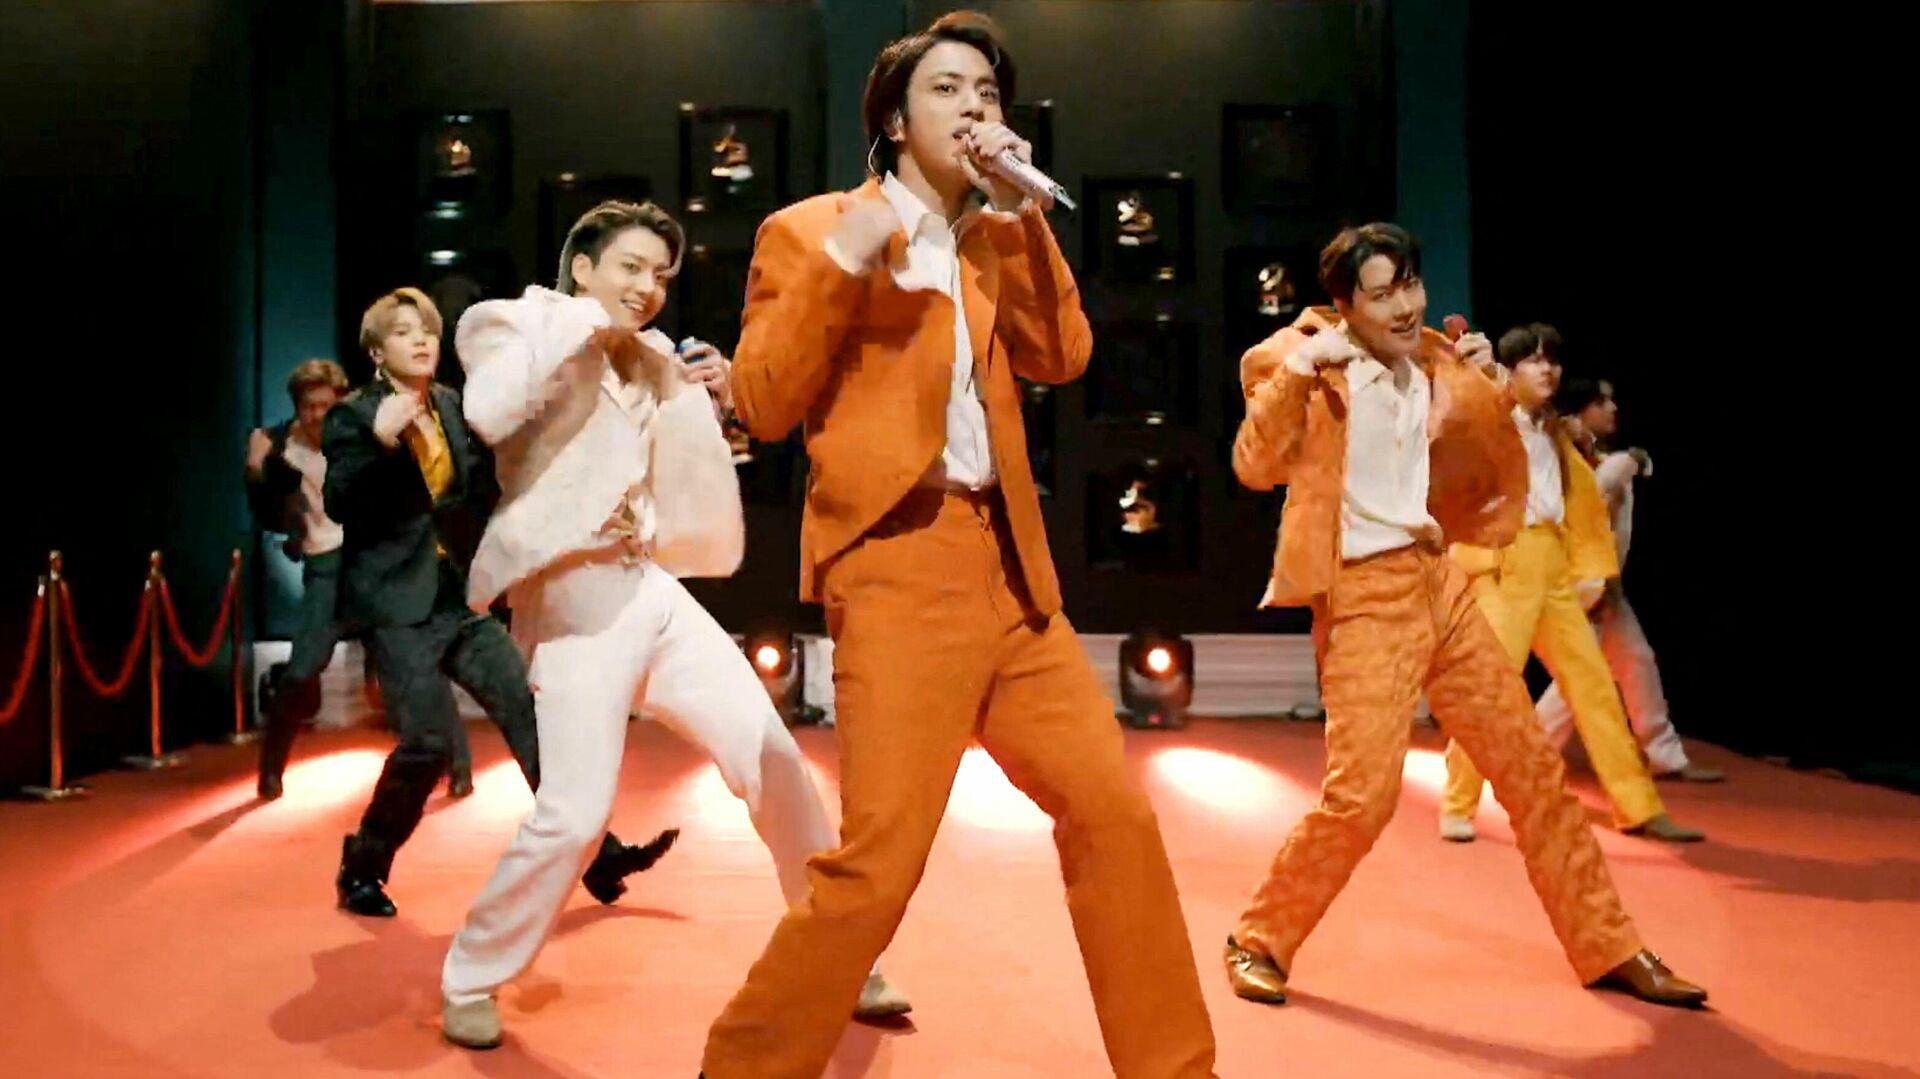 Banda surcoreana BTS en los premios Grammy 2021 - Sputnik Mundo, 1920, 17.03.2021